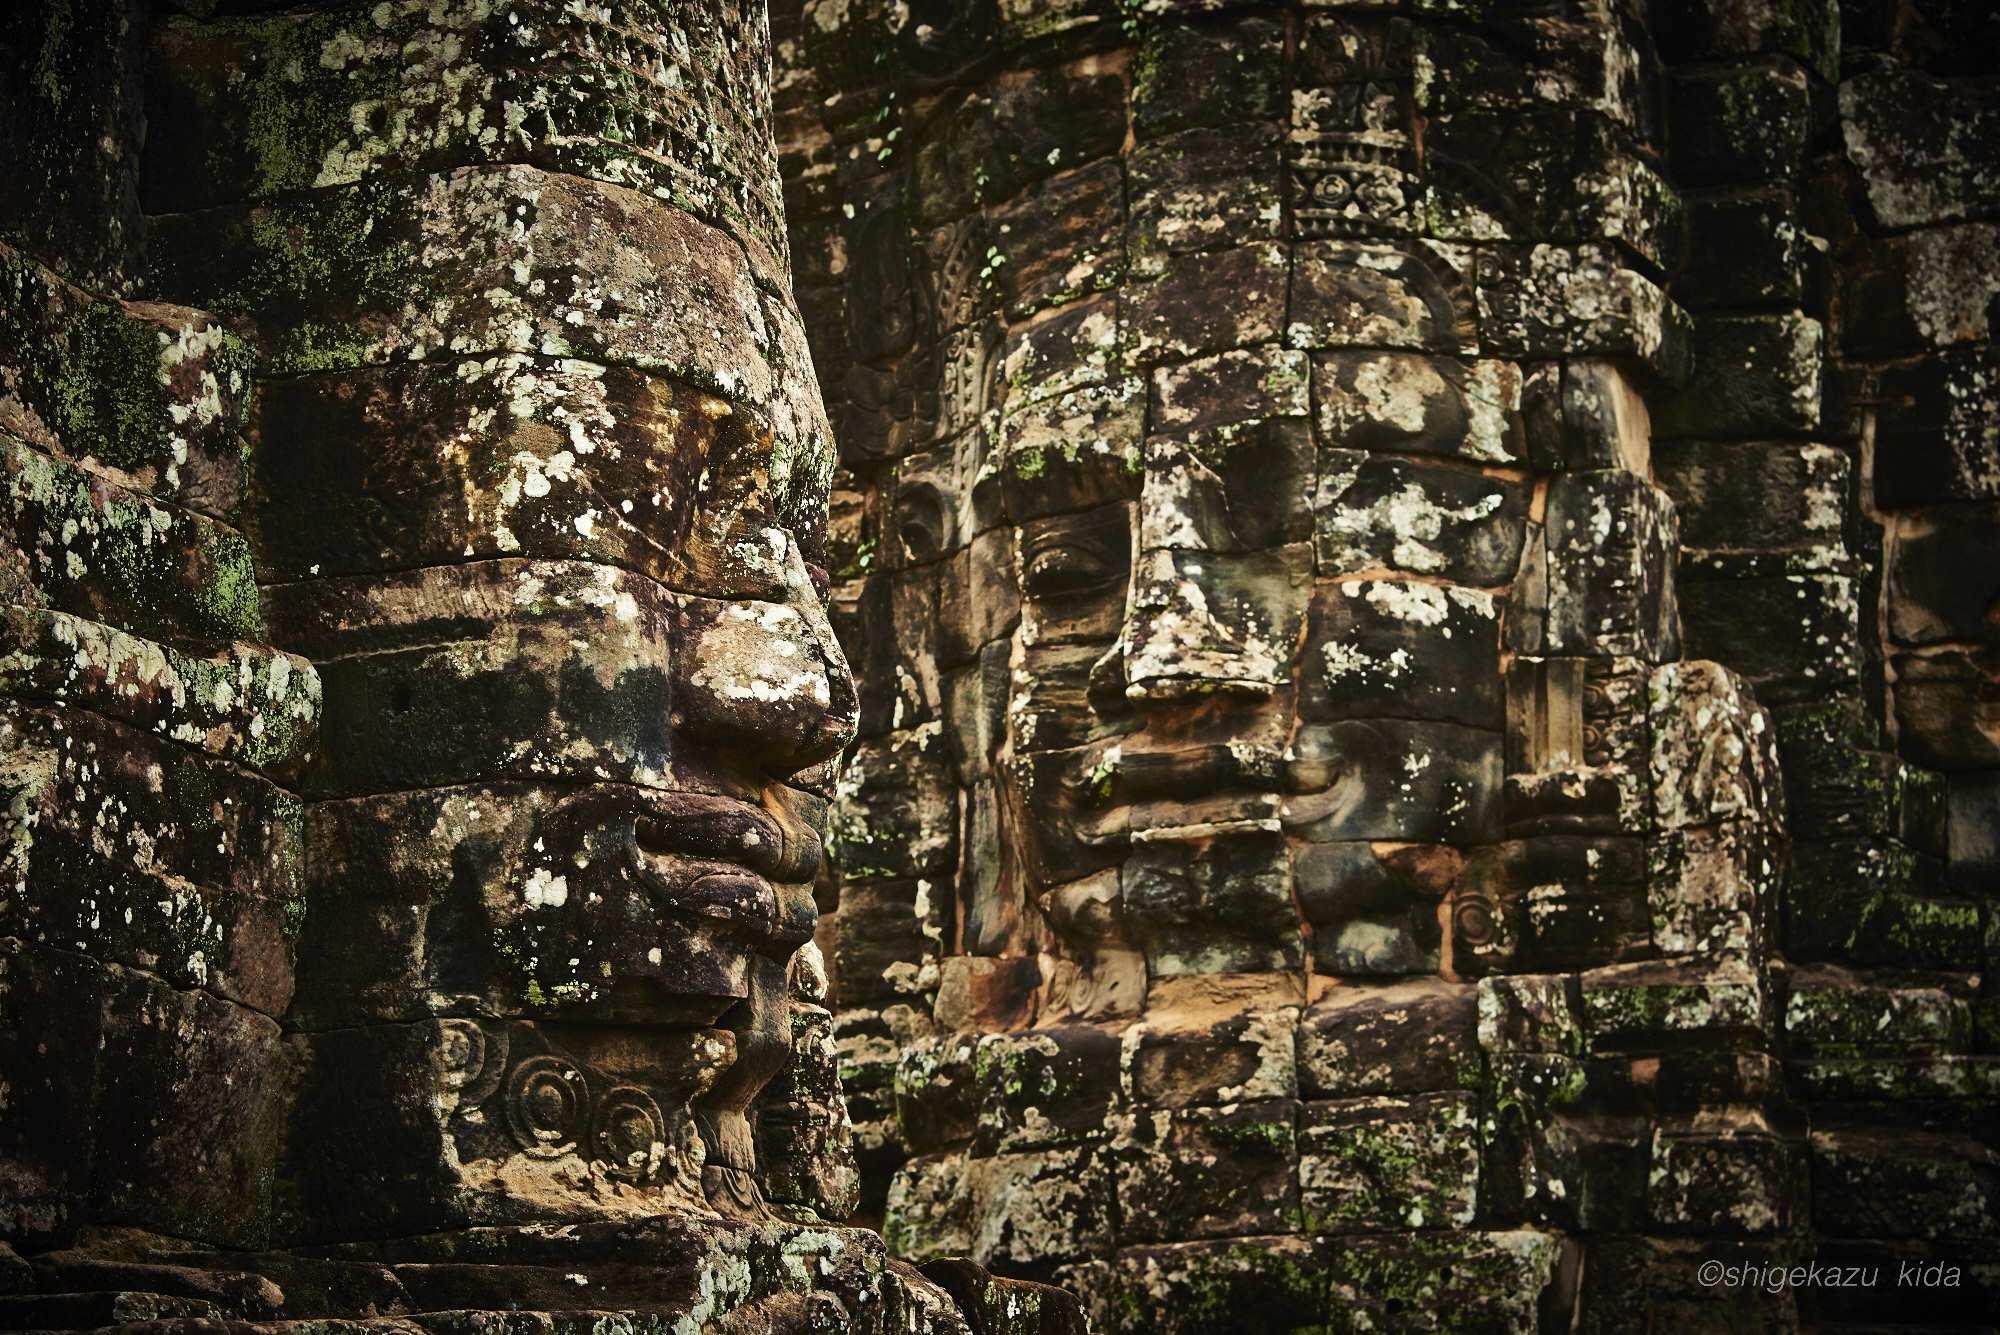 Angkor(アンコール)遺跡群にあるAngkorThom(アンコール・トム)のBayon(バイヨン)の観世音菩薩の石仏の顔